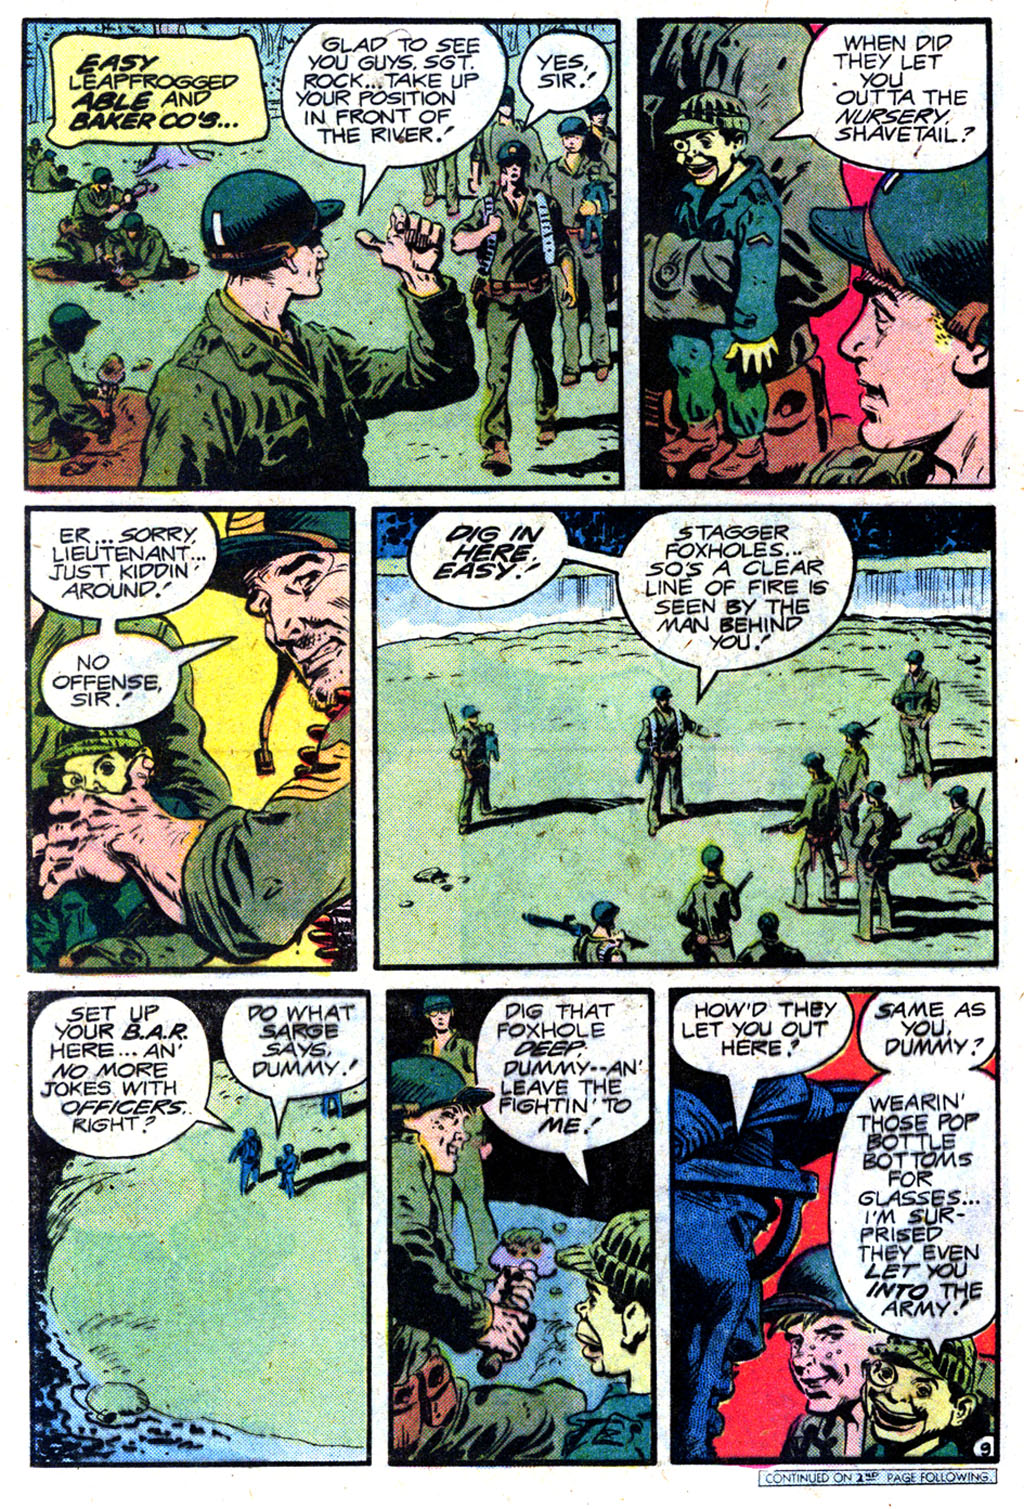 Read online Sgt. Rock comic -  Issue #349 - 9